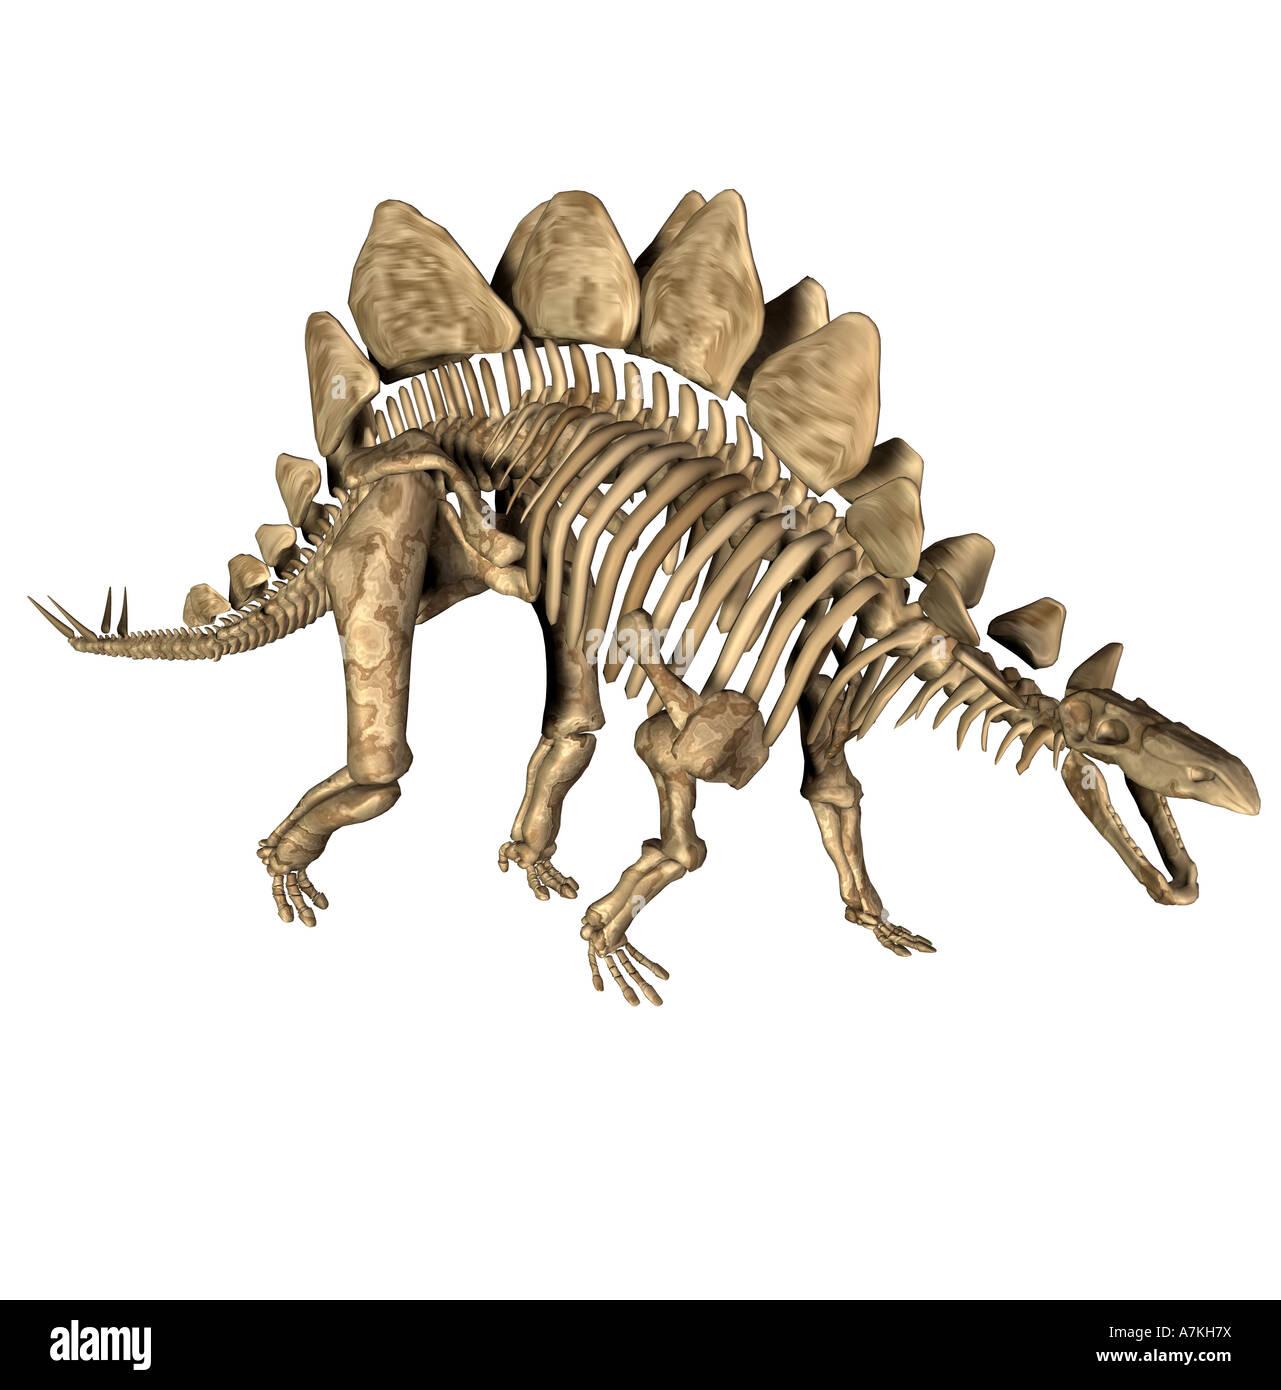 Stegosaurus dinosaur skeleton - Stock Image